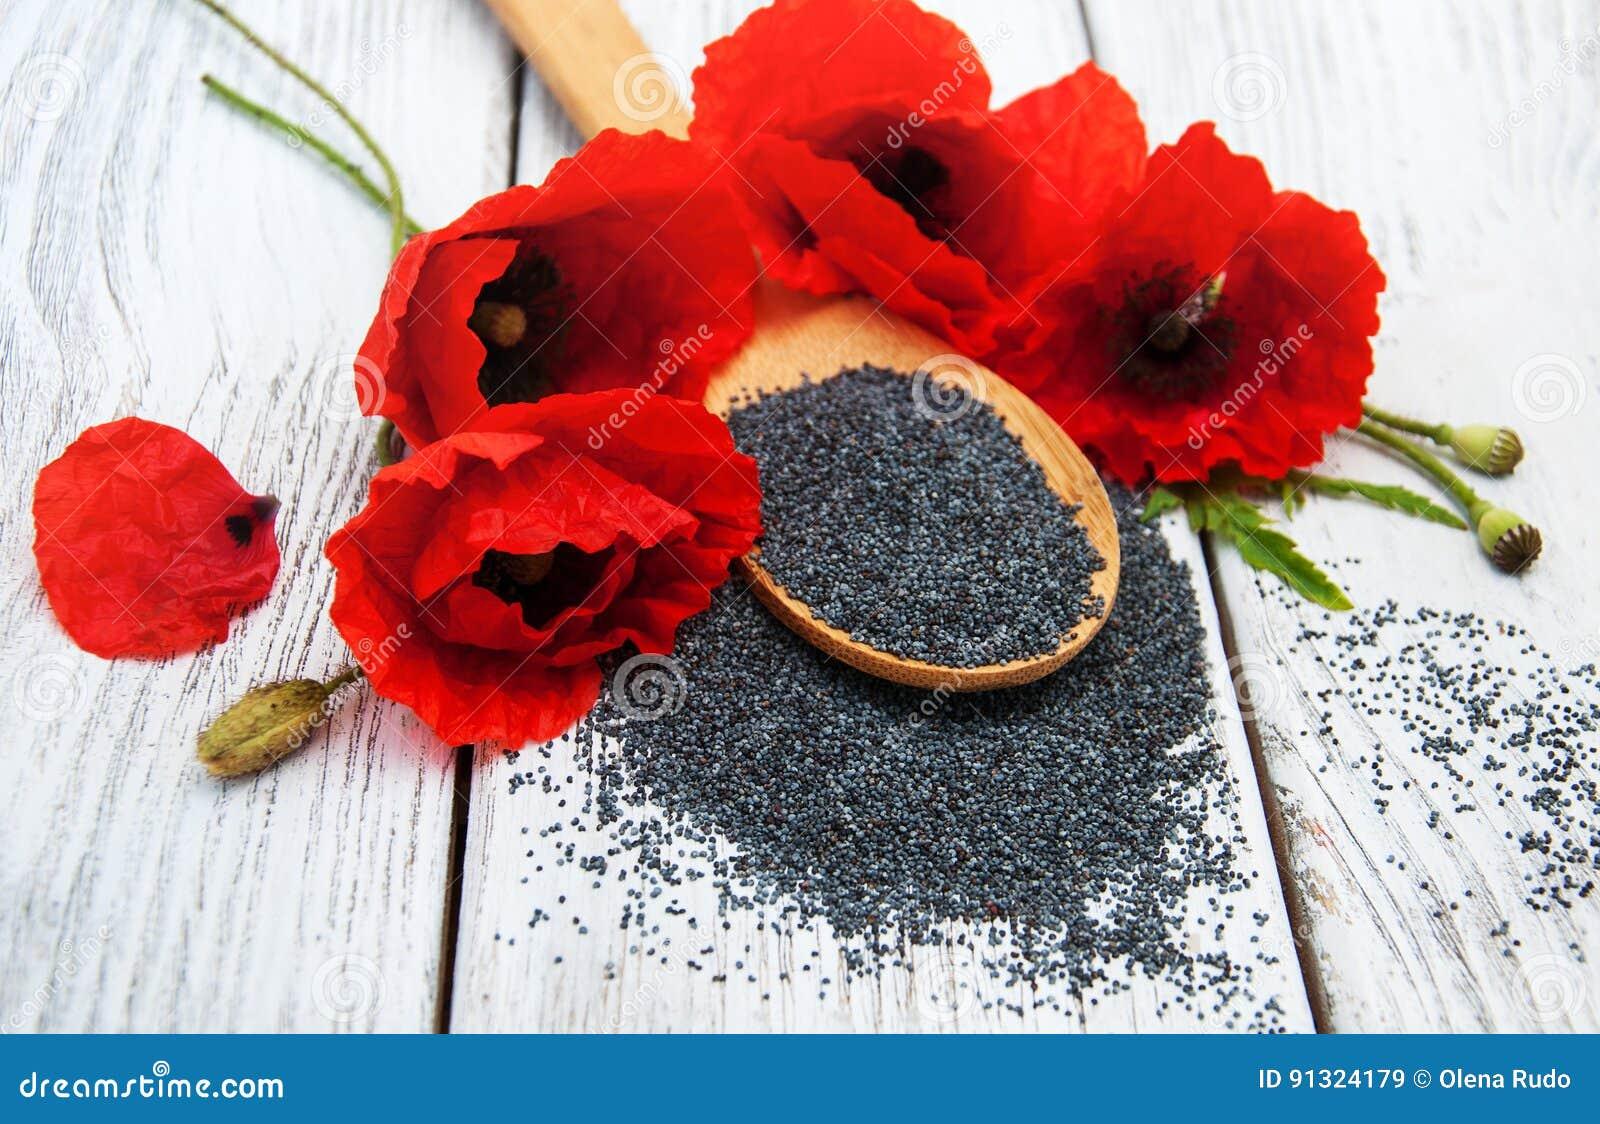 Poppy seeds and flowers stock image image of eating 91324179 download poppy seeds and flowers stock image image of eating 91324179 mightylinksfo